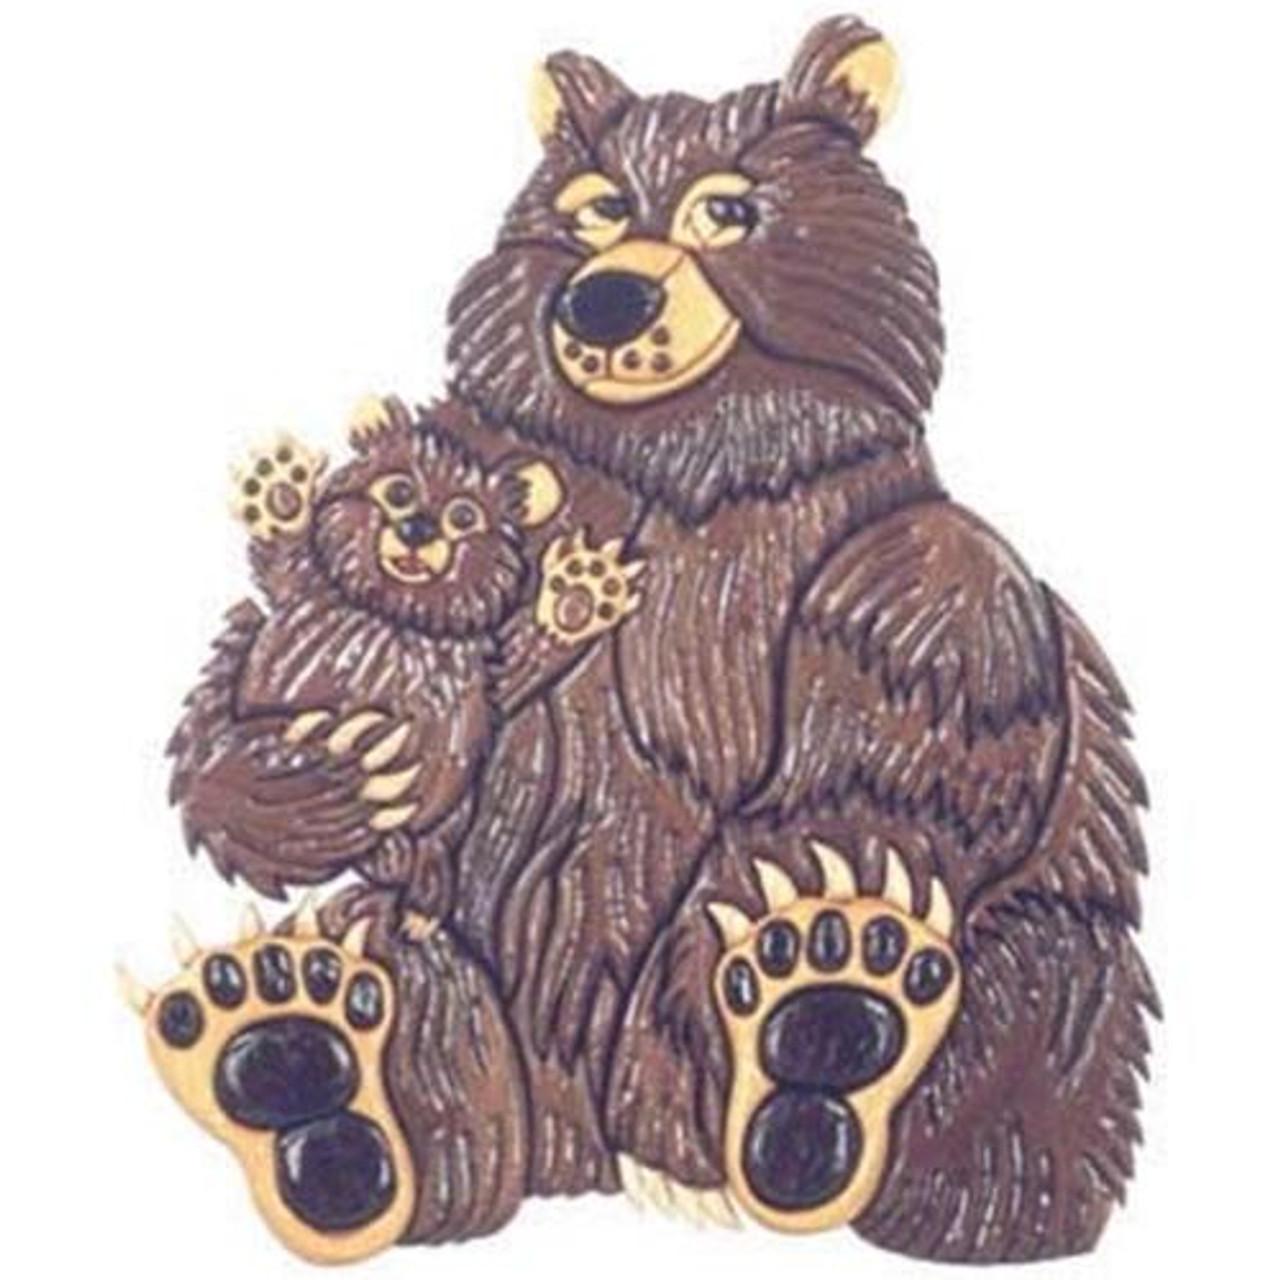 Cherry Tree Toys Bears Intarsia Plan